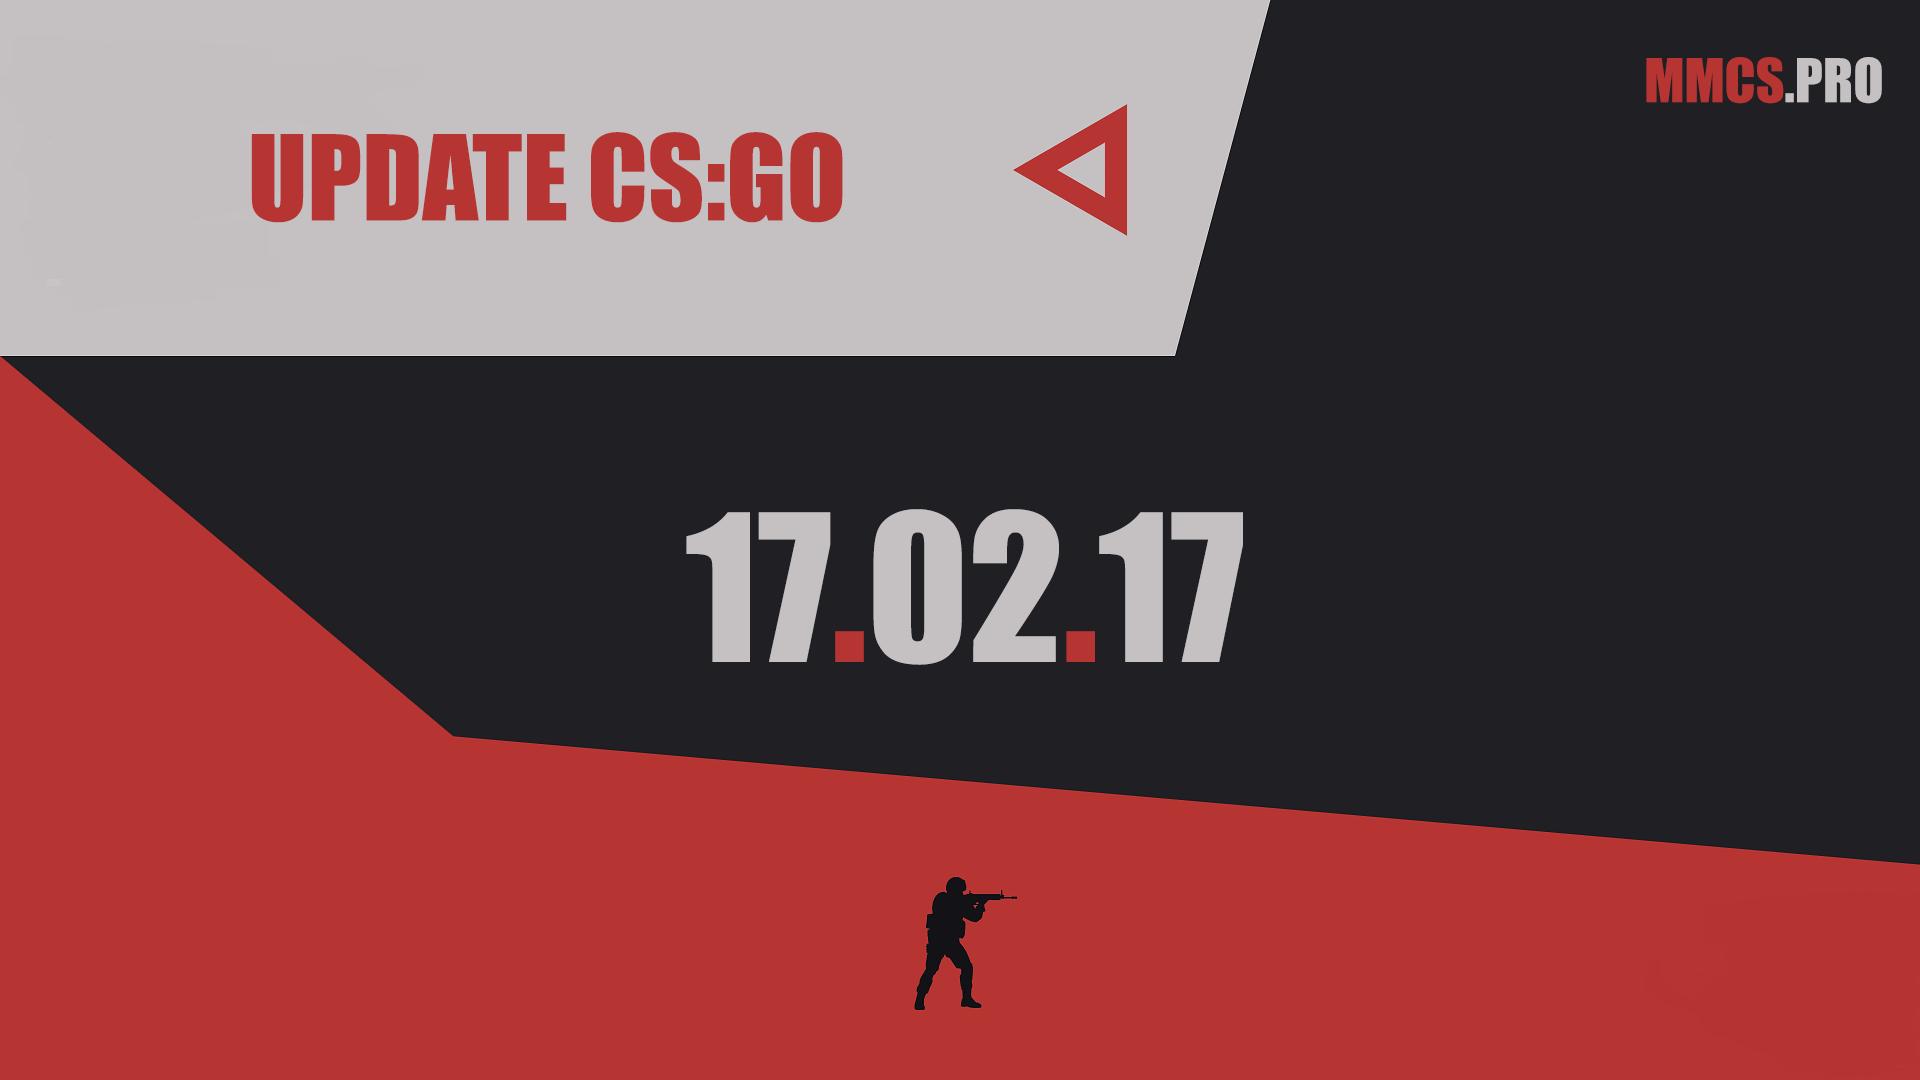 https://mmcs.pro/update-csgo-17-02-2017-valve/